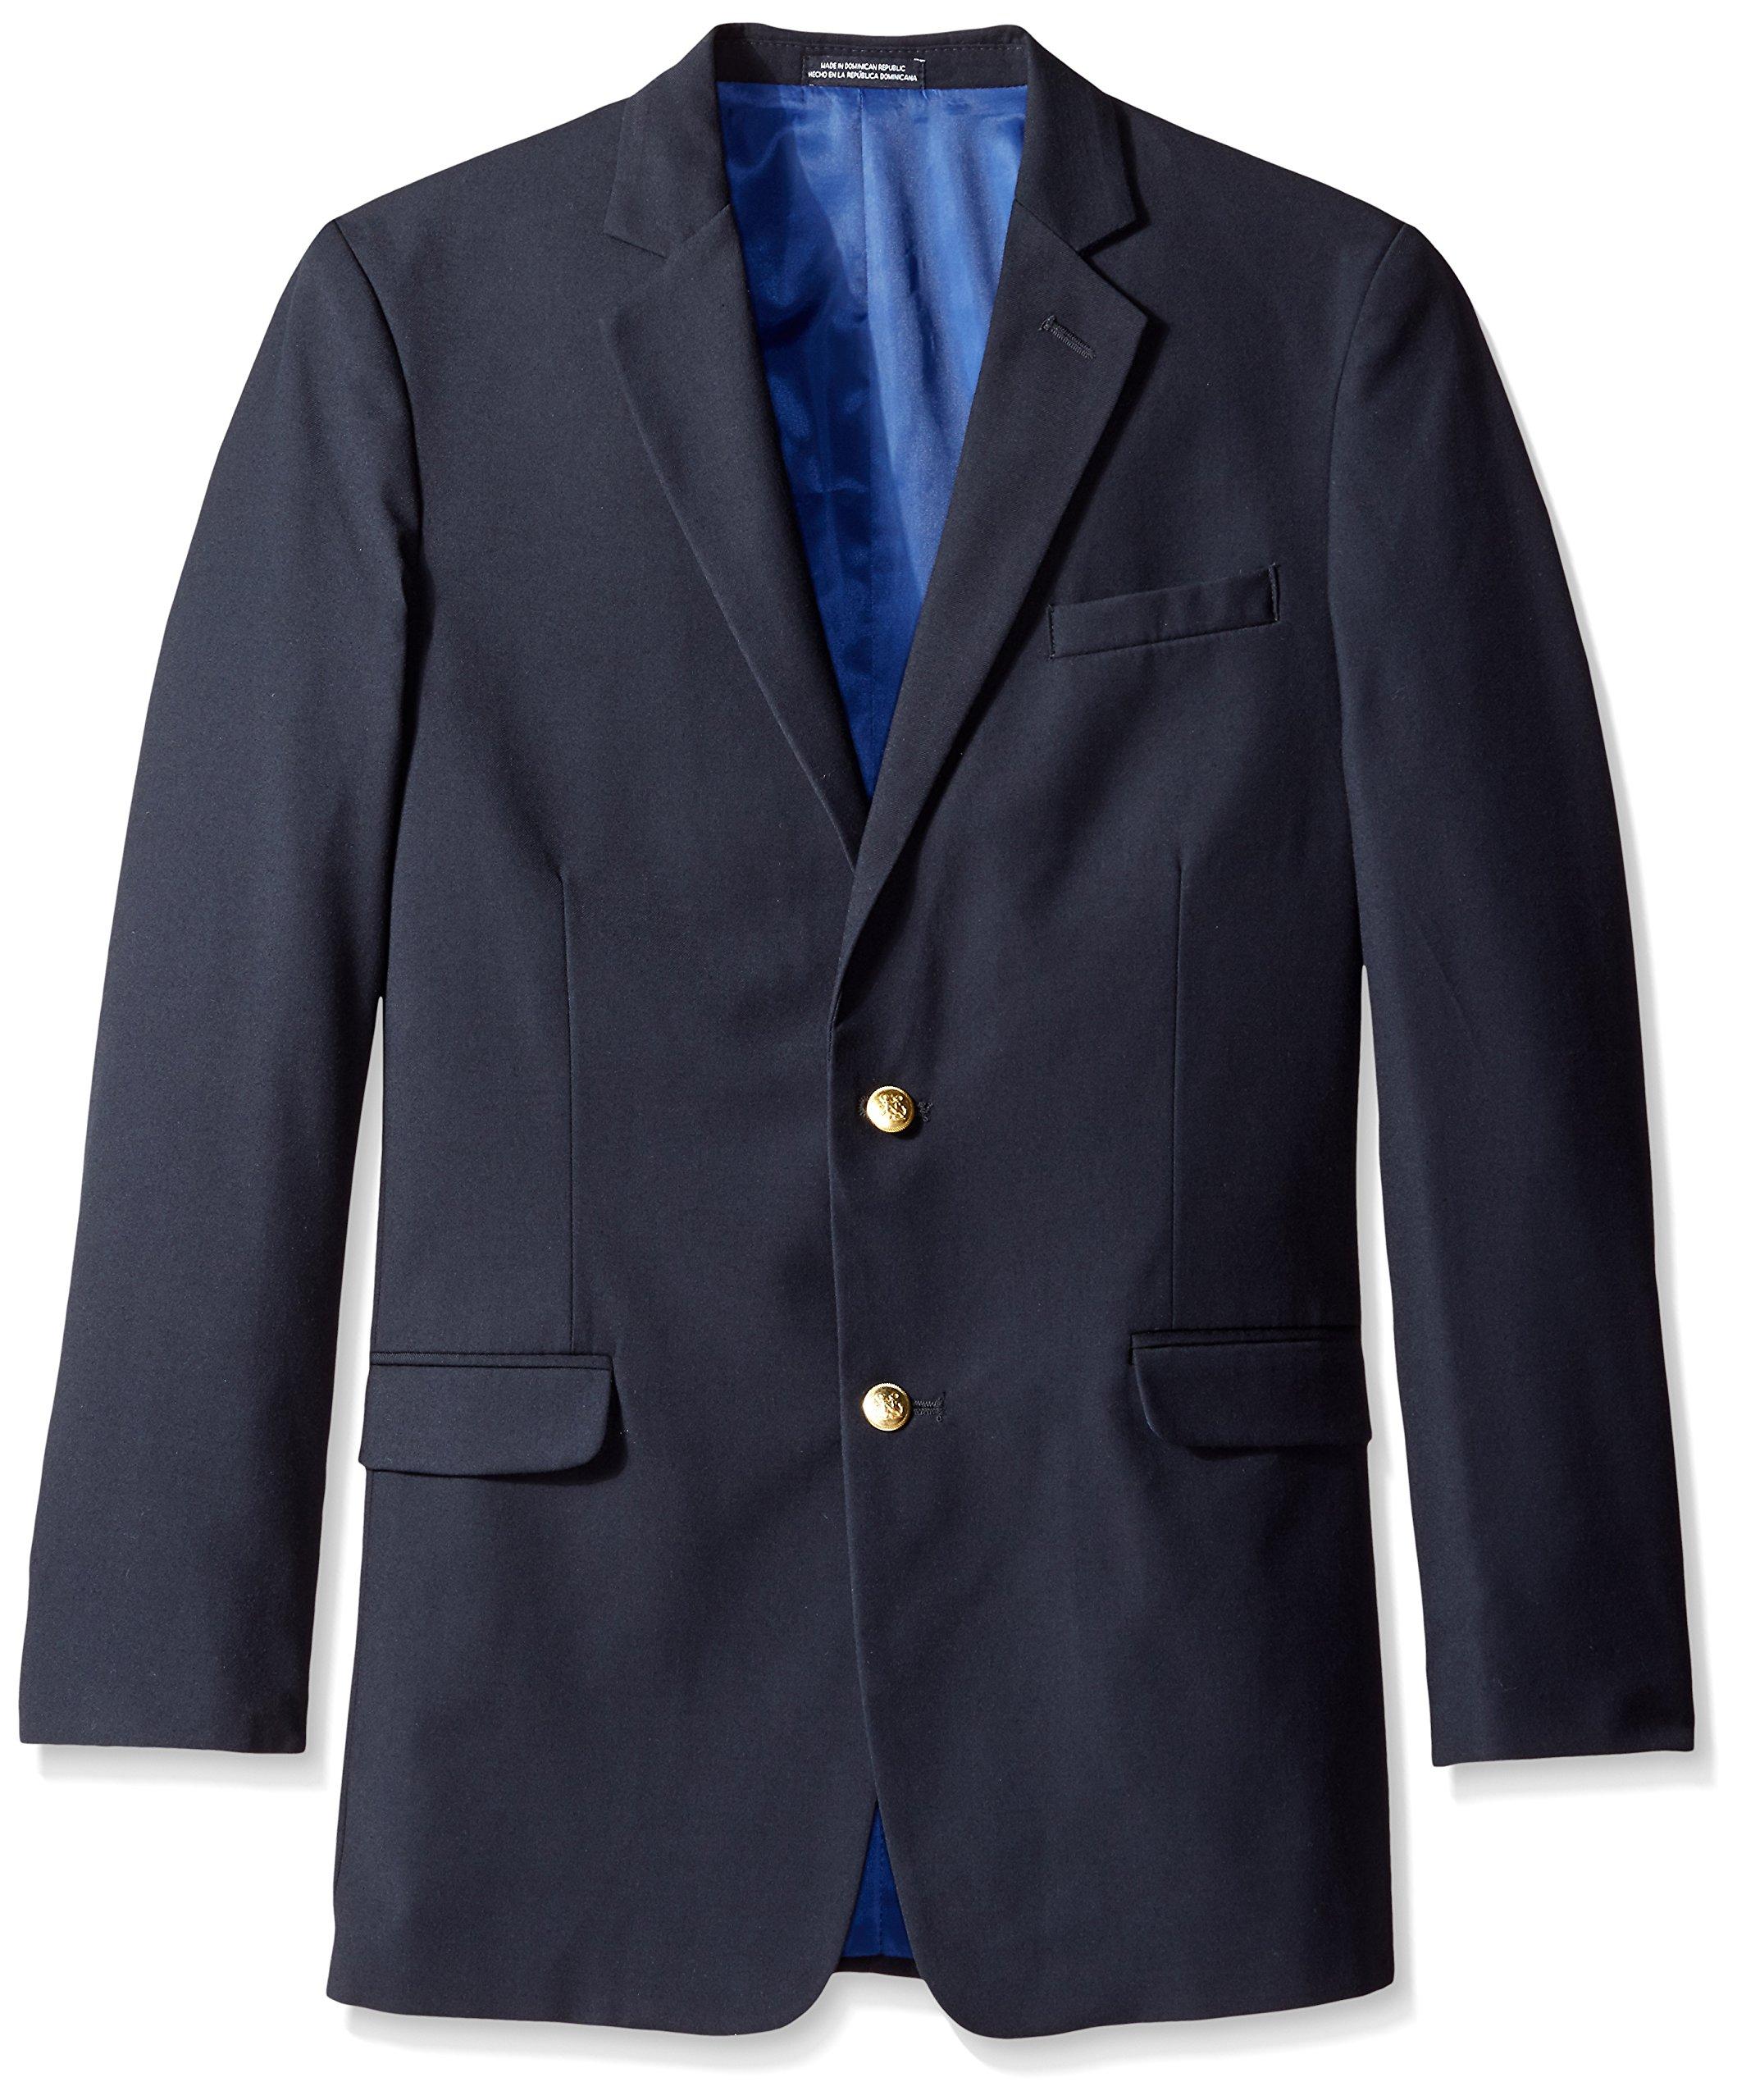 Nautica Big Boys' Navy Blazer, Dark Blue, 14